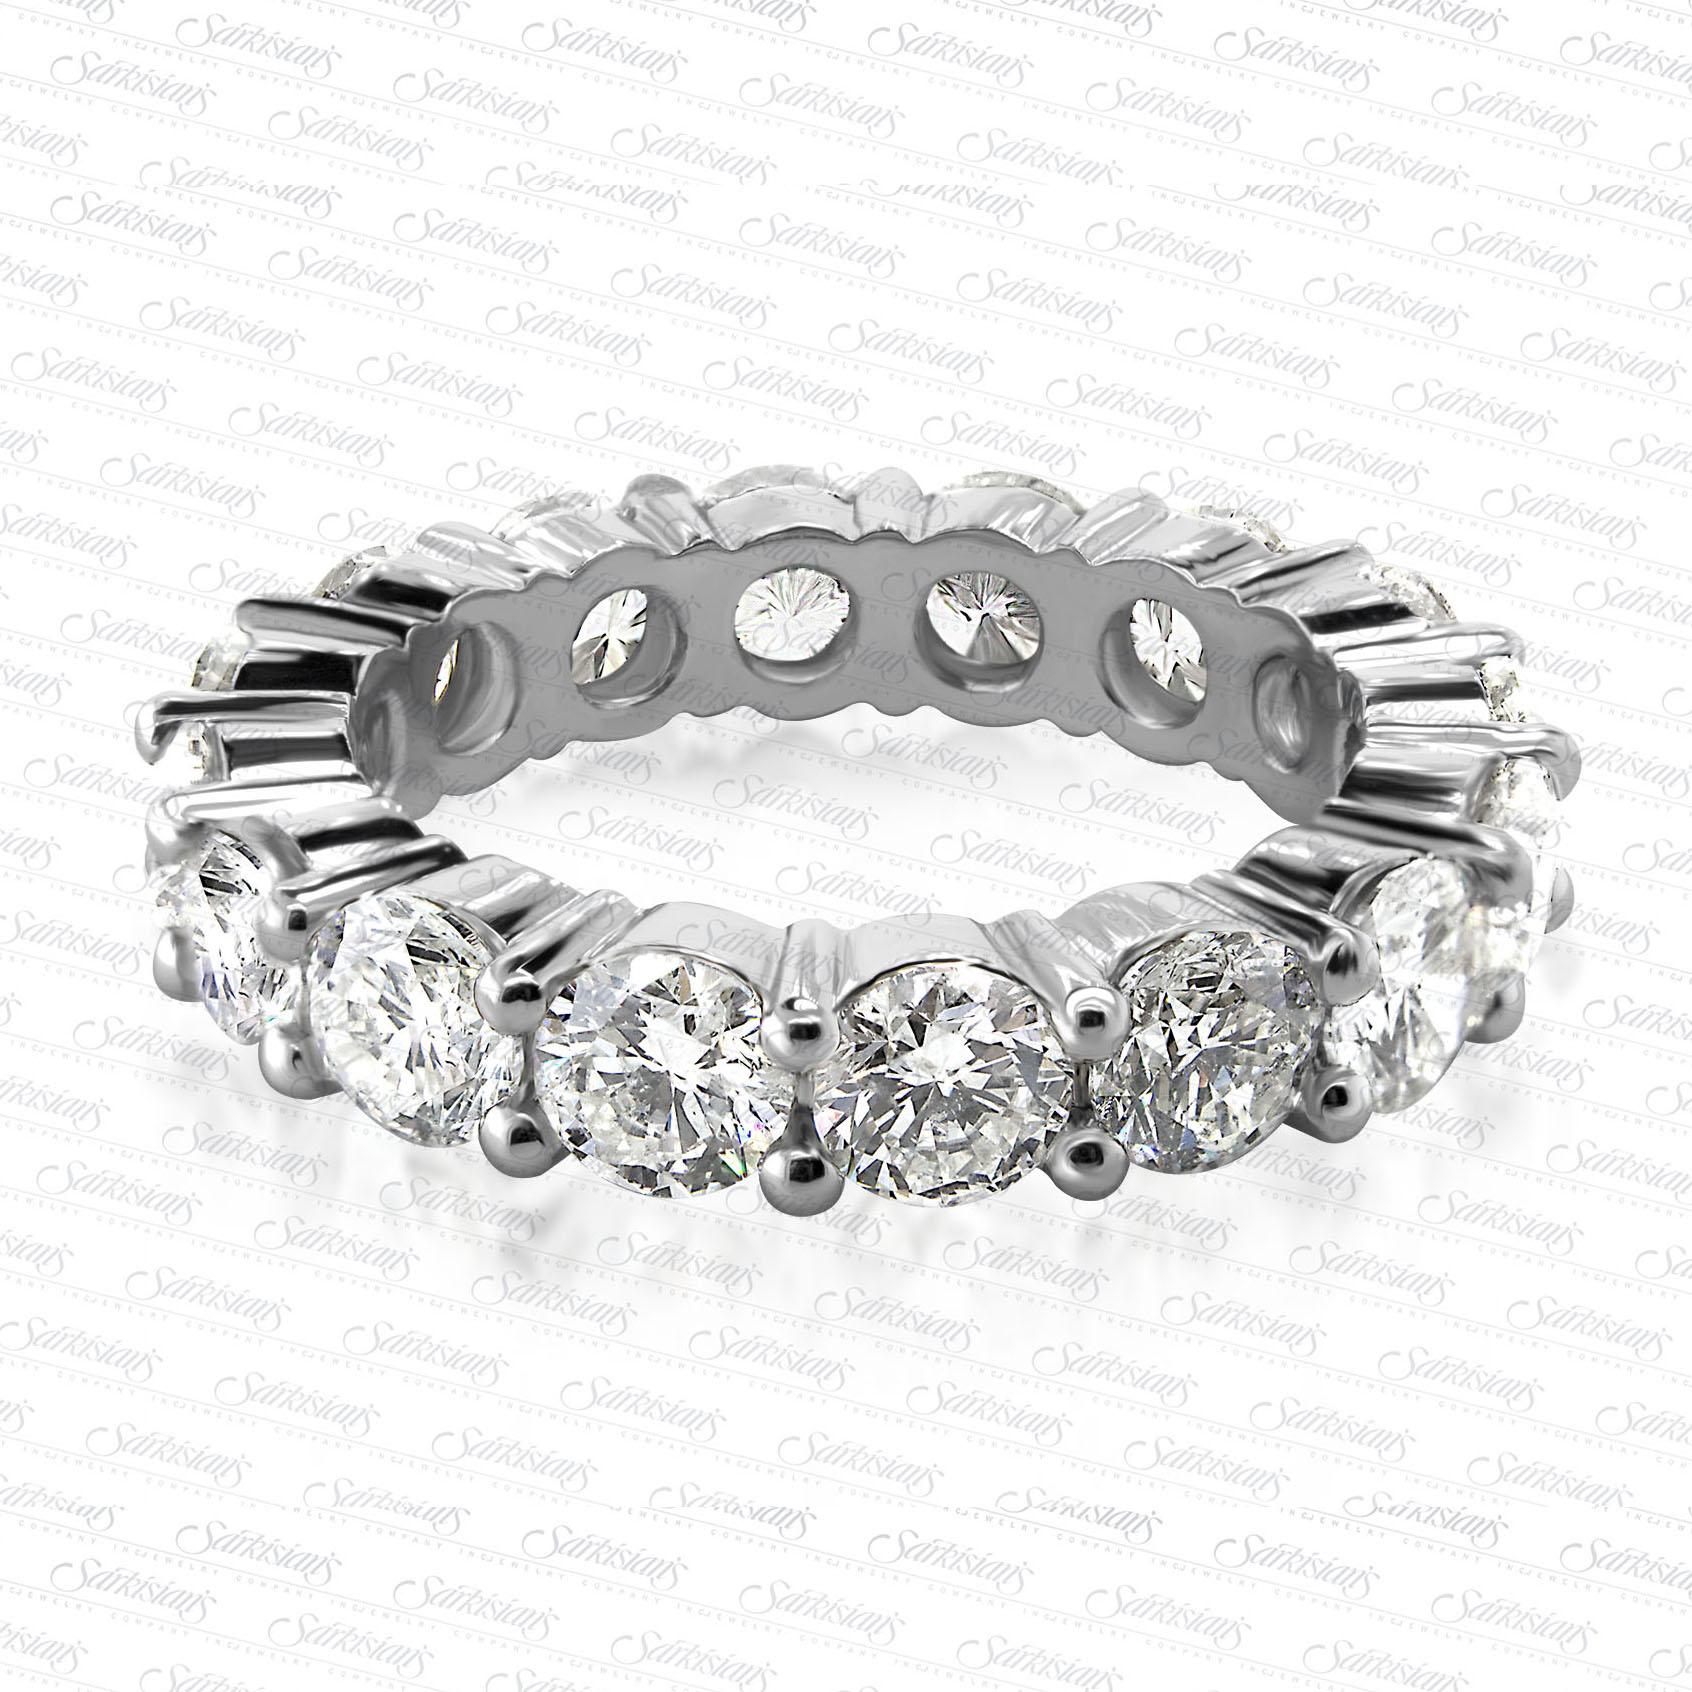 Diamond Eternity Ring 5 0 Carats, Gold or Platinum